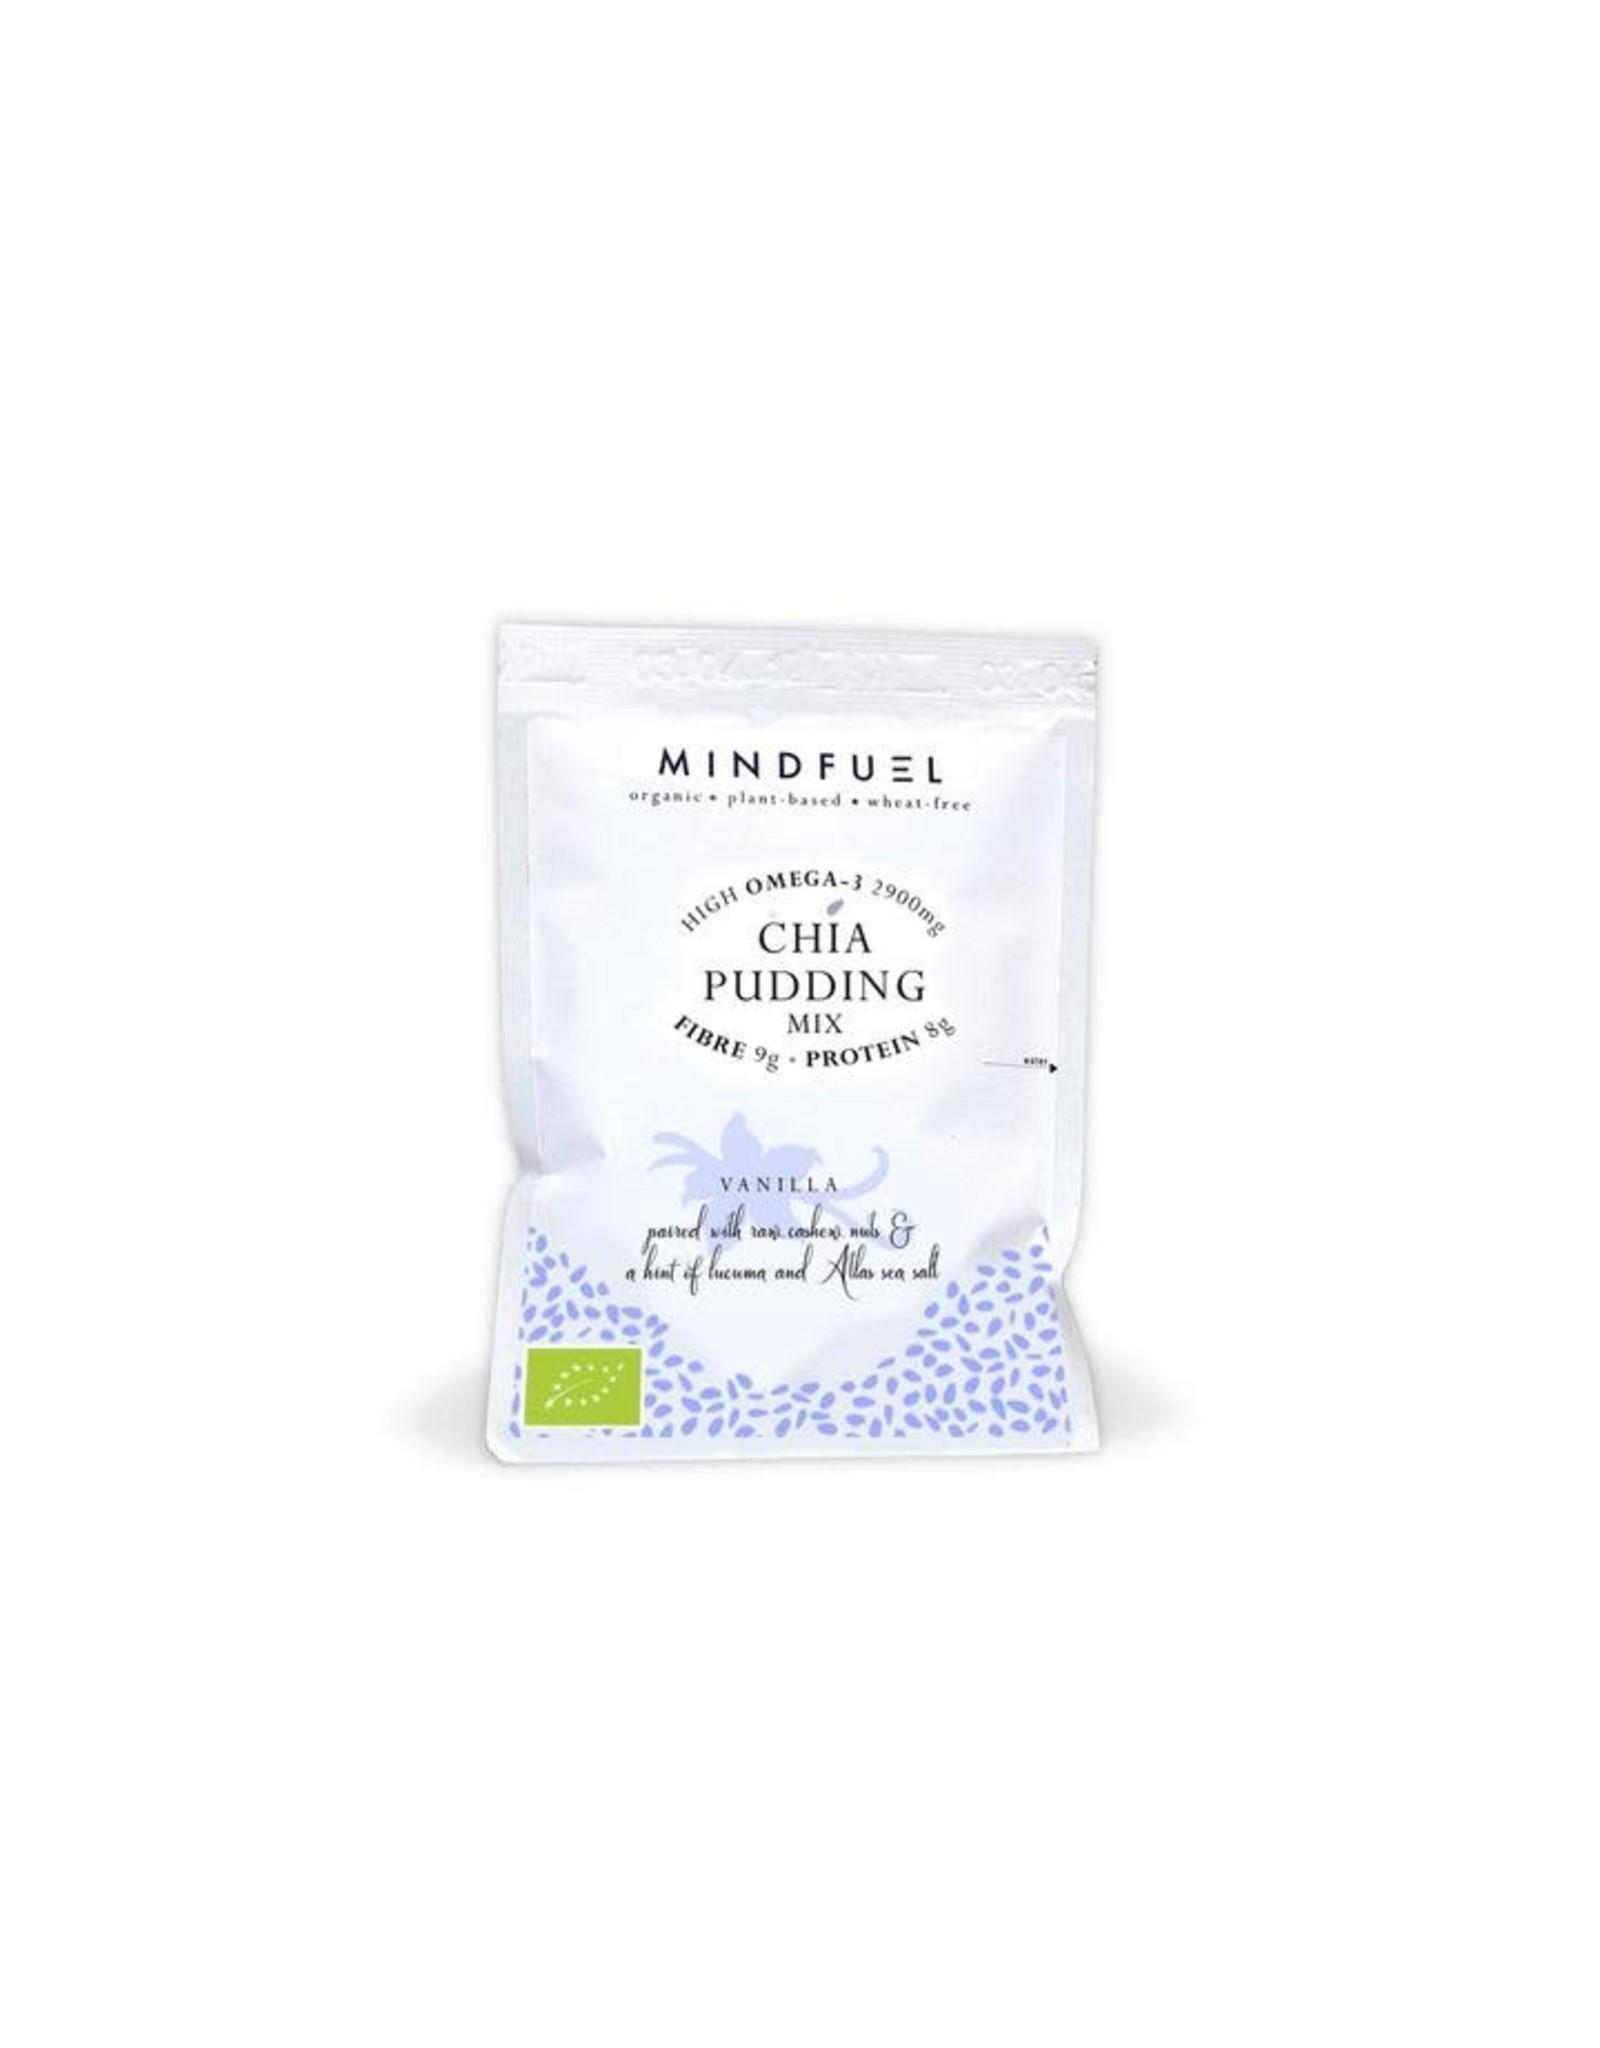 Mindfuel Chia Pudding - Vanilla - 50g